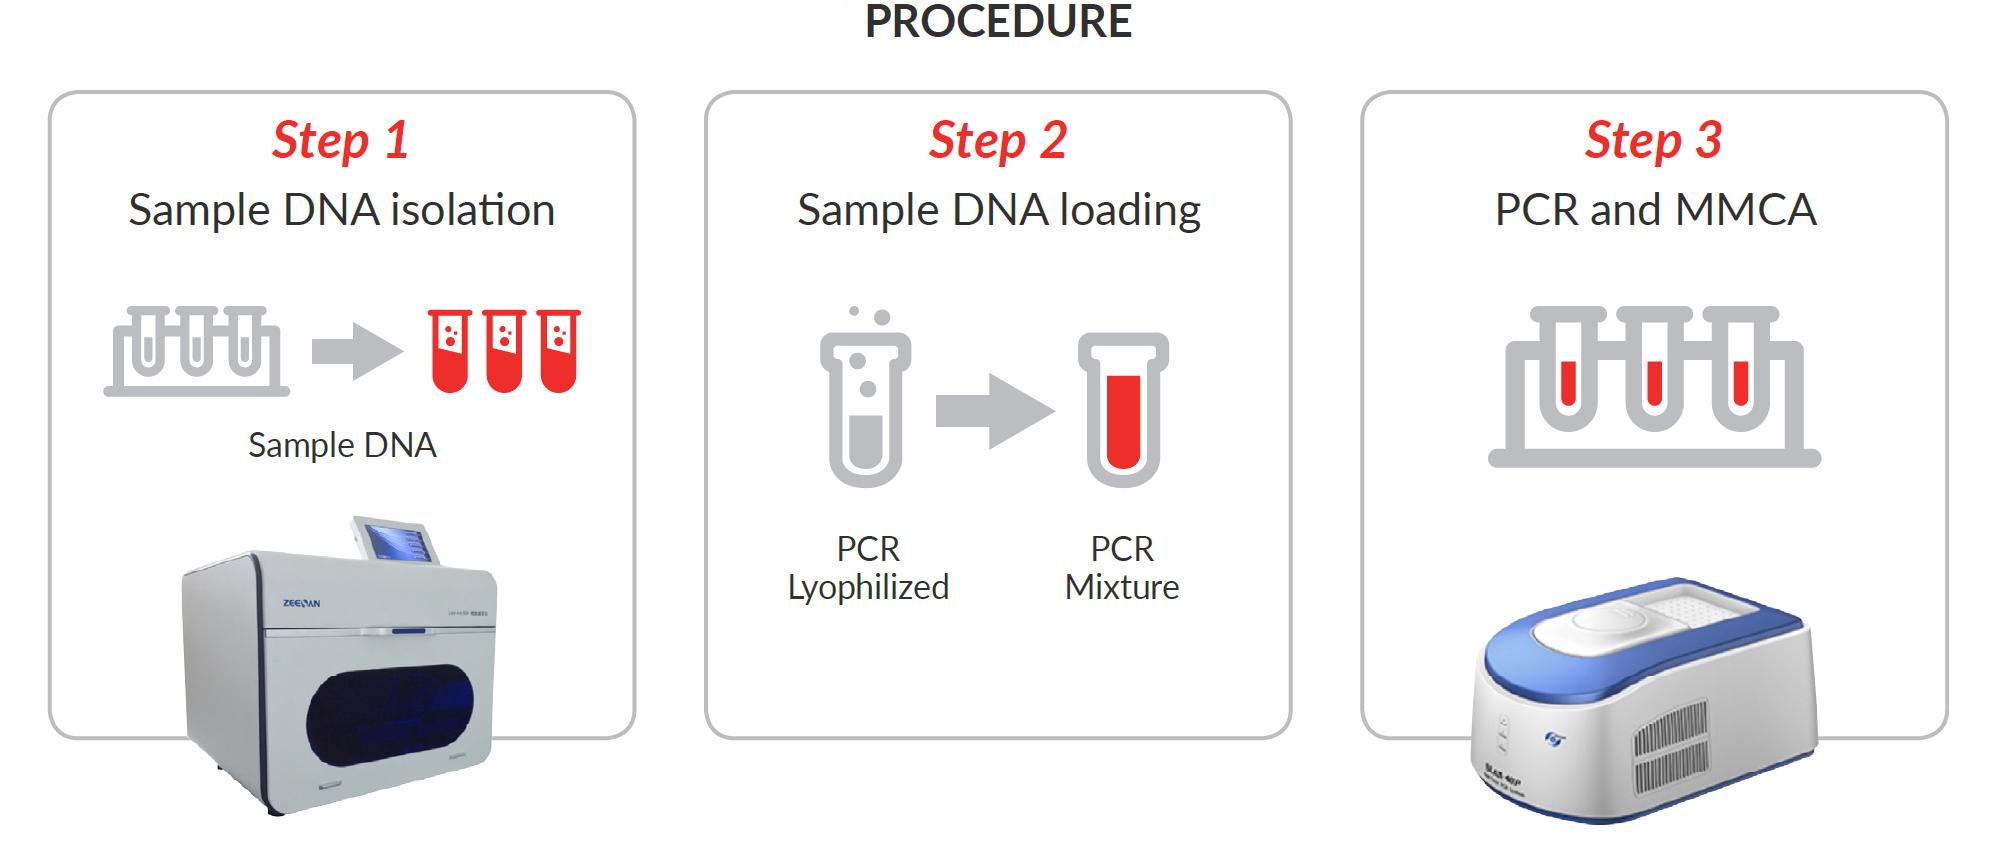 hpv high risk genotypes pcr